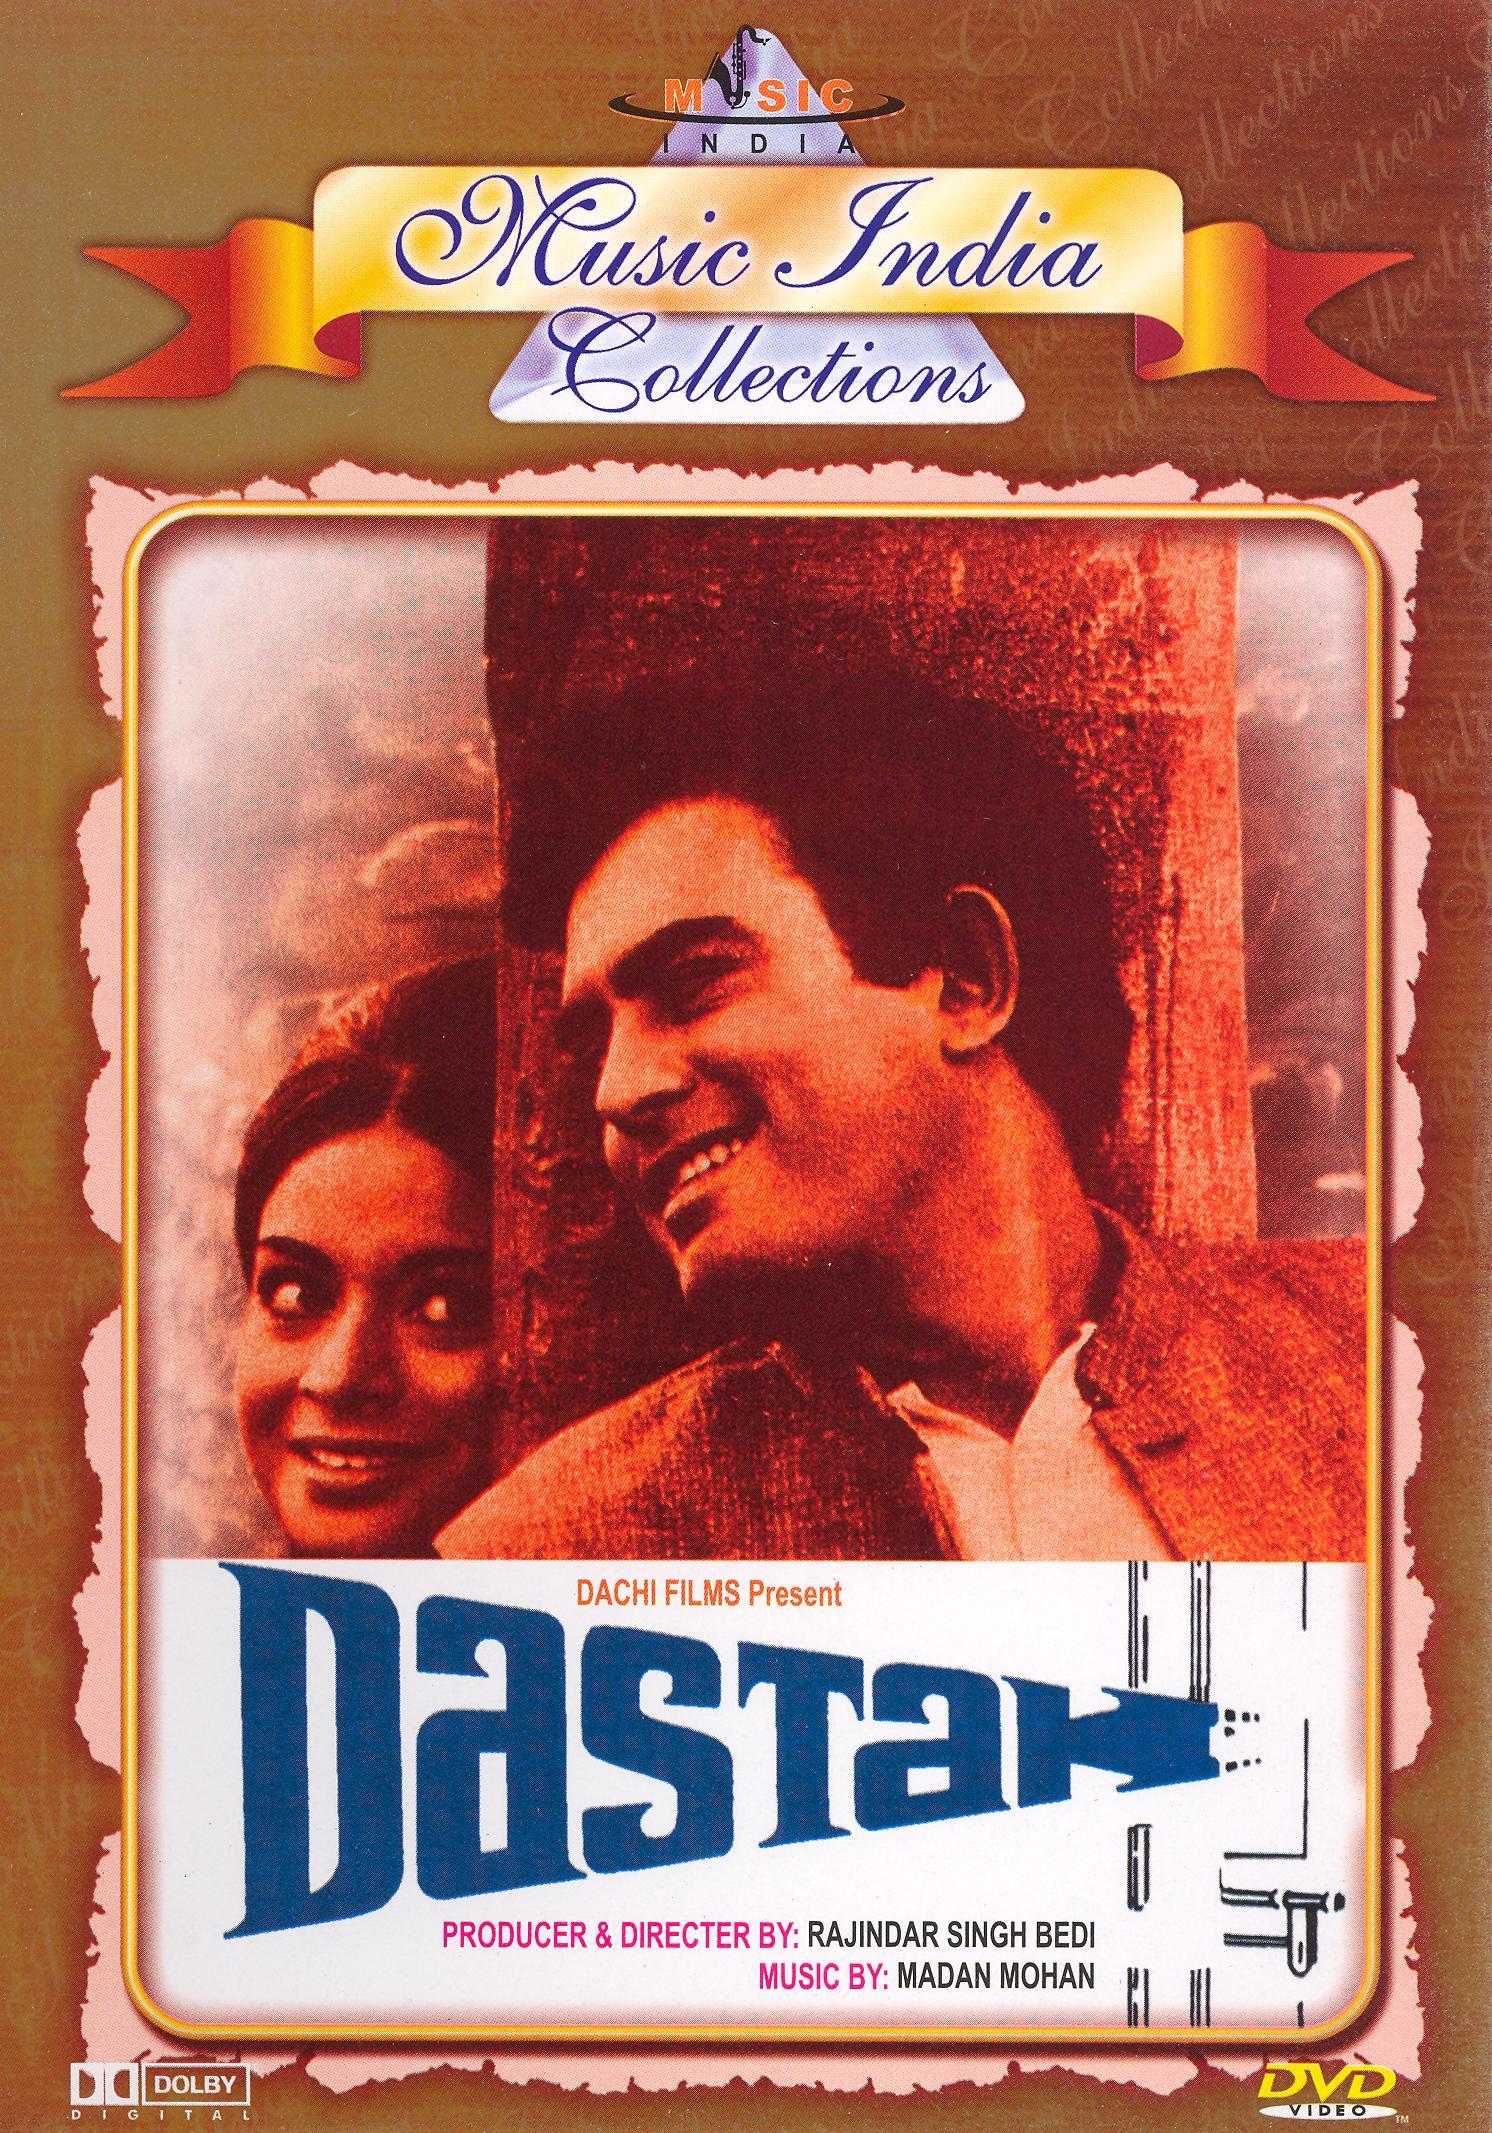 The movie dastak